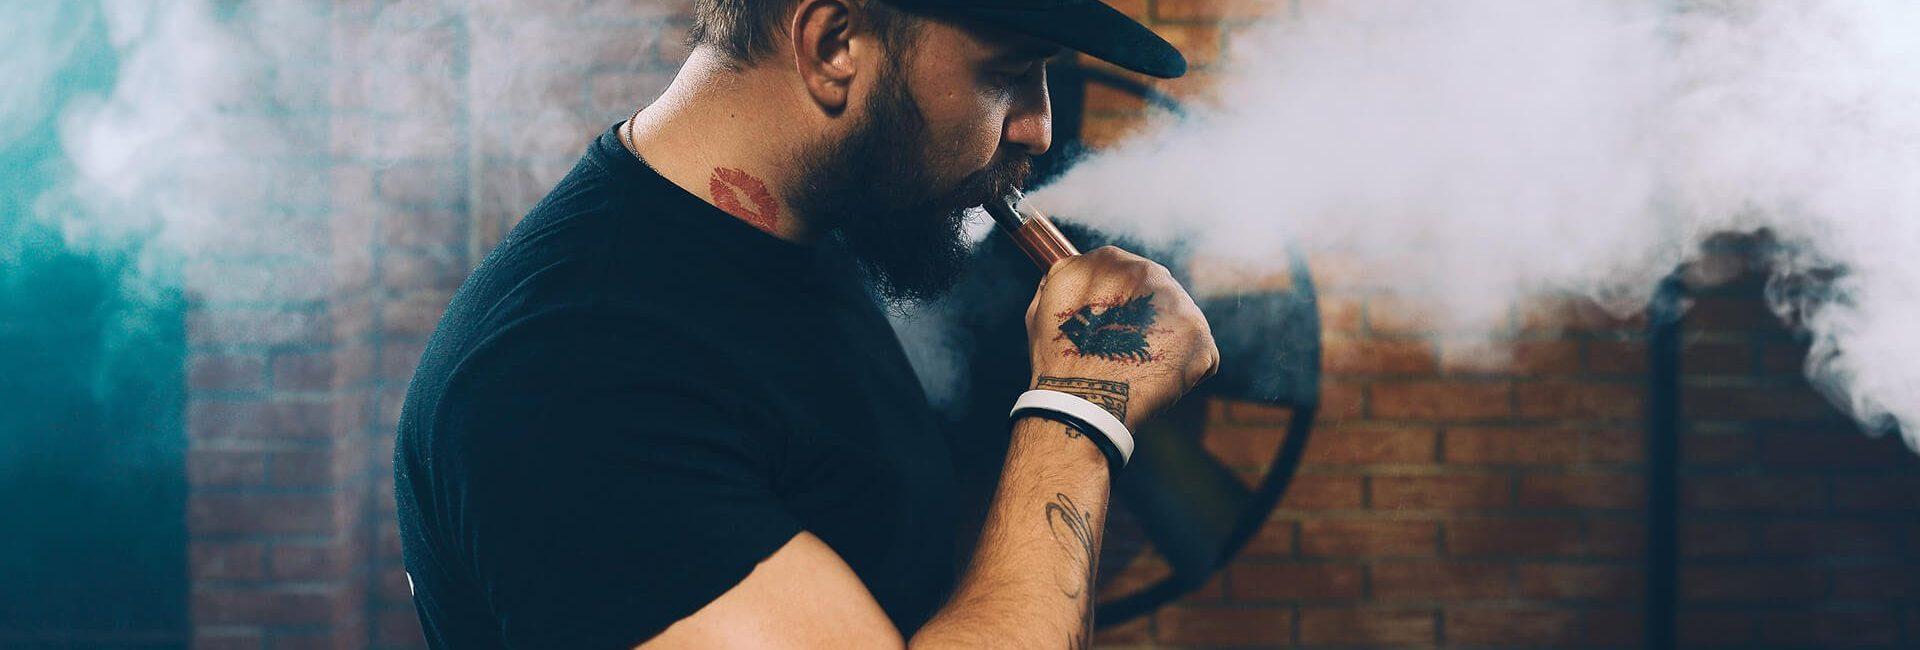 man-vaping-an-electronic-cigarette-PHZW7TQ